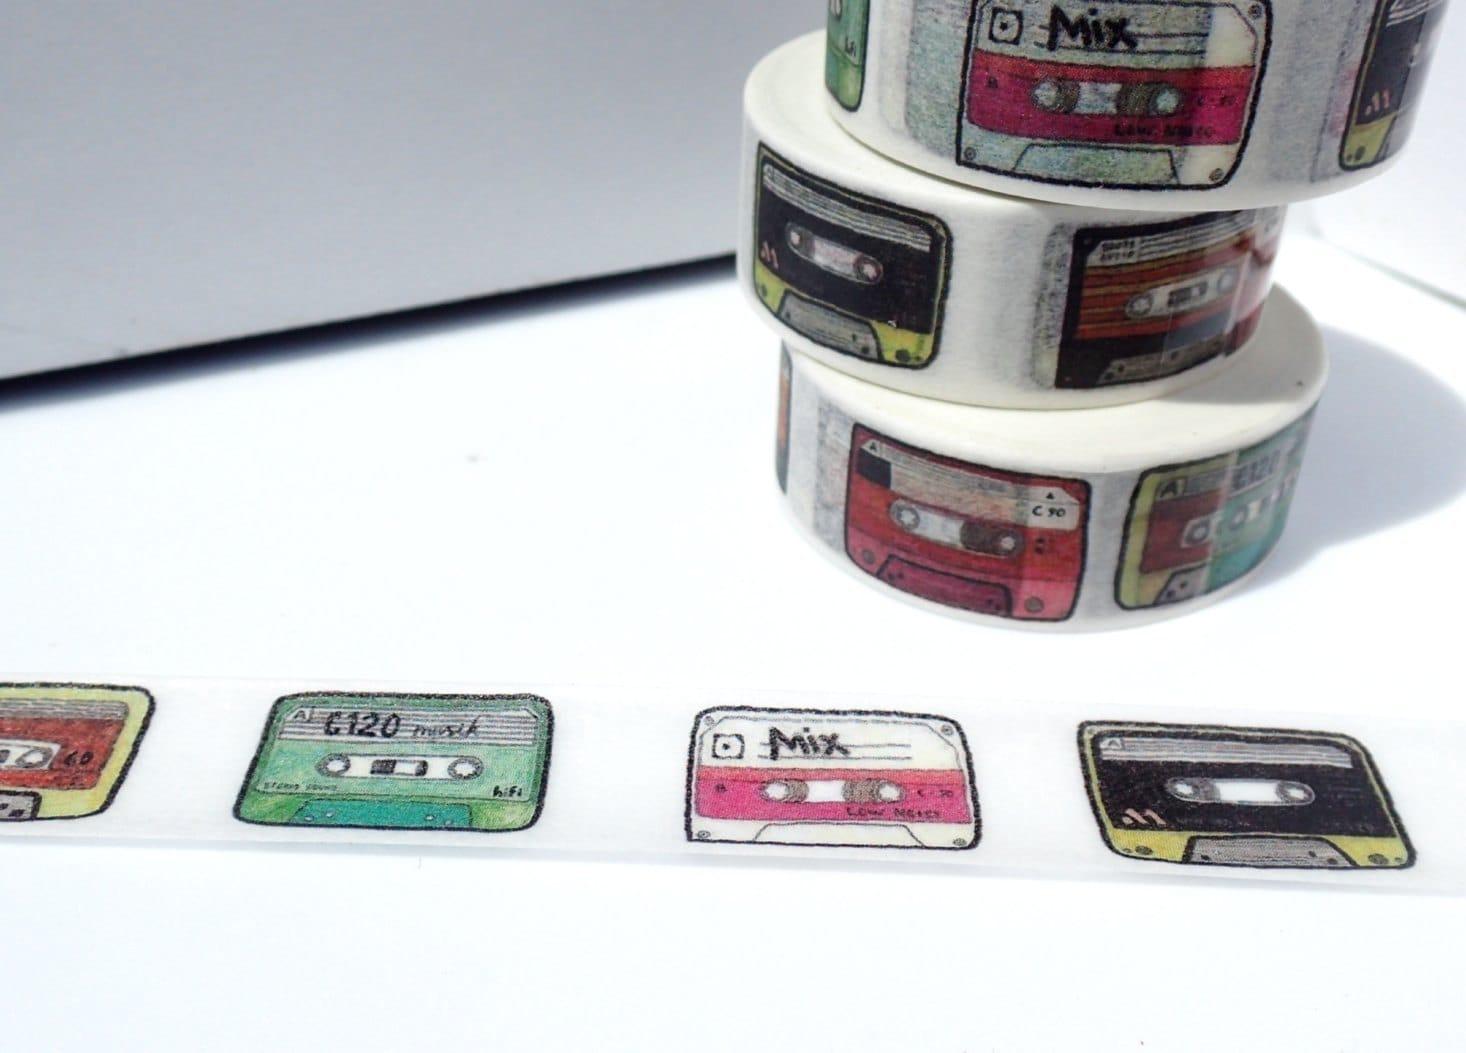 Cassette tape washi tape paper tape great for scrapbooking paper cassette tape washi tape paper tape great for scrapbooking paper crafts and decorations mix tape 80s retro vintage music 15mm x 10m jeuxipadfo Images